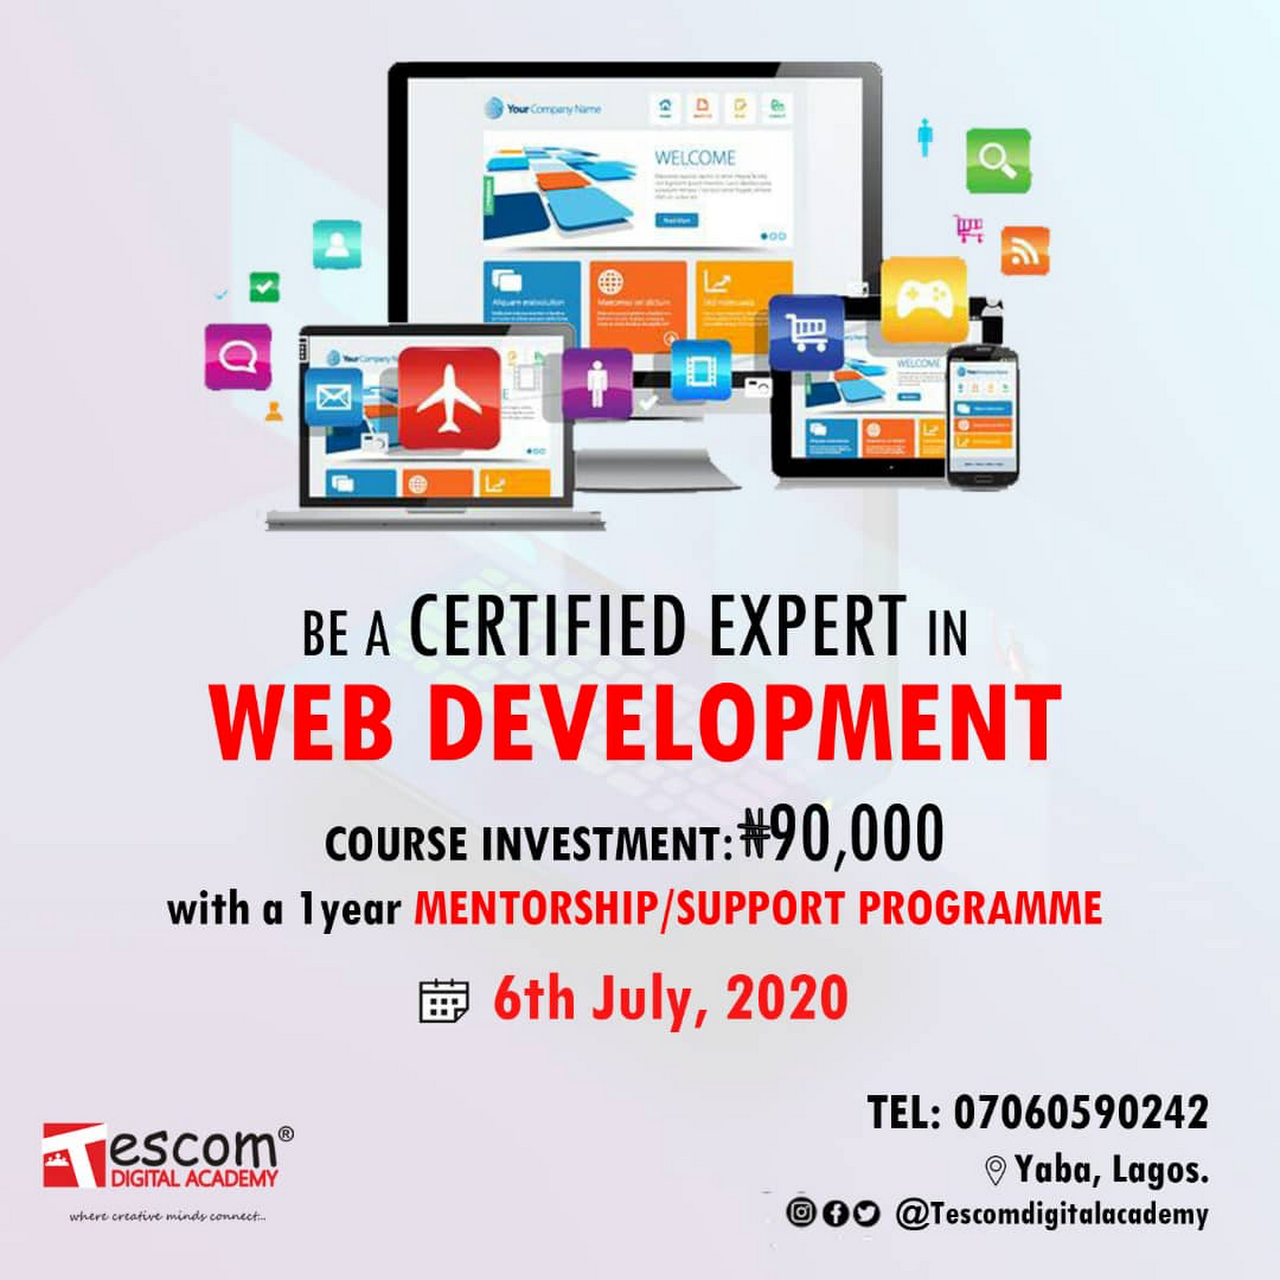 Tescom Digital Academy Web Design And Development Graphic Design Training Digital Marketing Training Course In Lagos Nigeria Educational Institution In Lagos